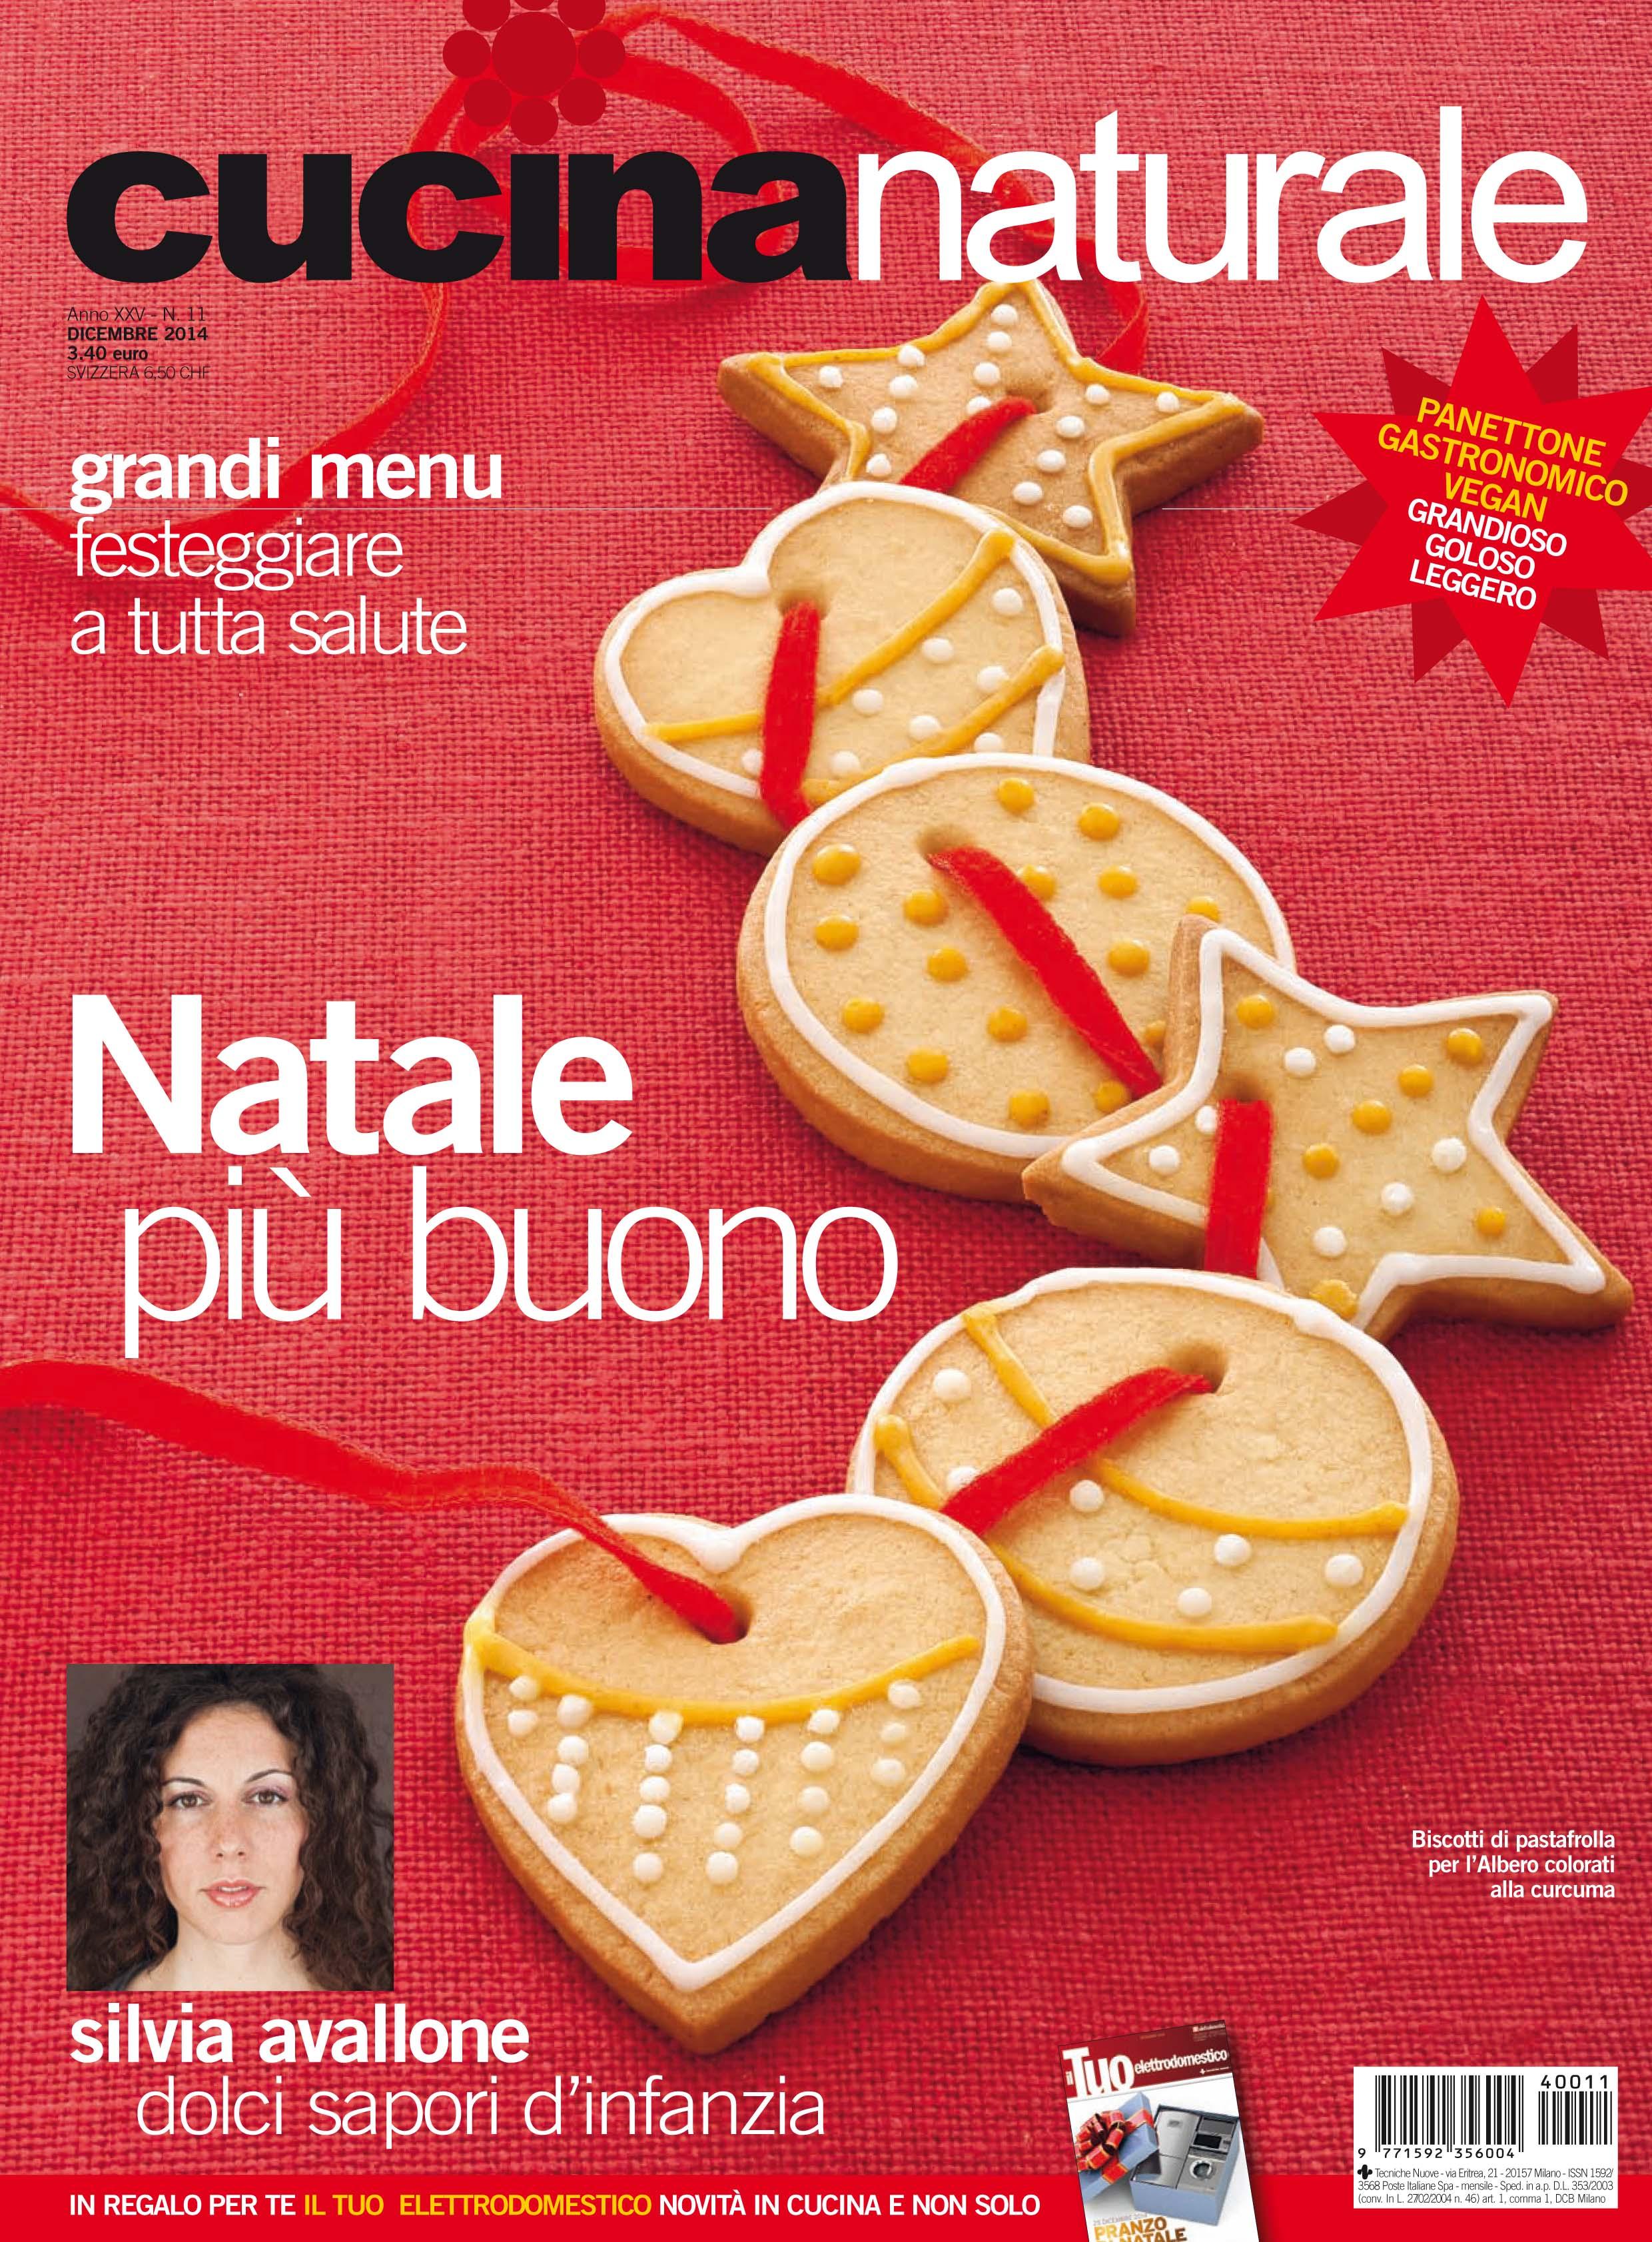 Cucina Naturale di dicembre: Un ricco Natale vegetariano - Cucina ...